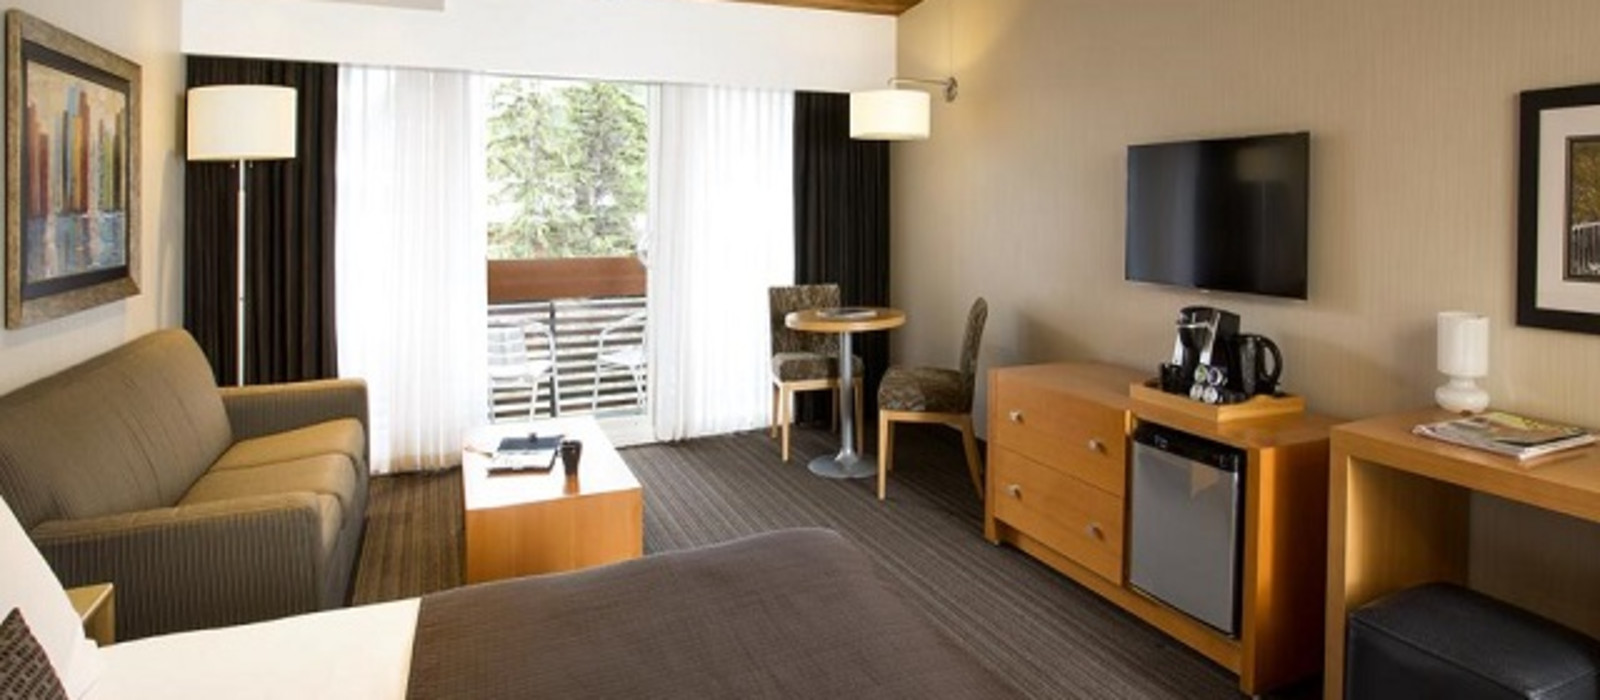 Hotel Banff Aspen Lodge Canada